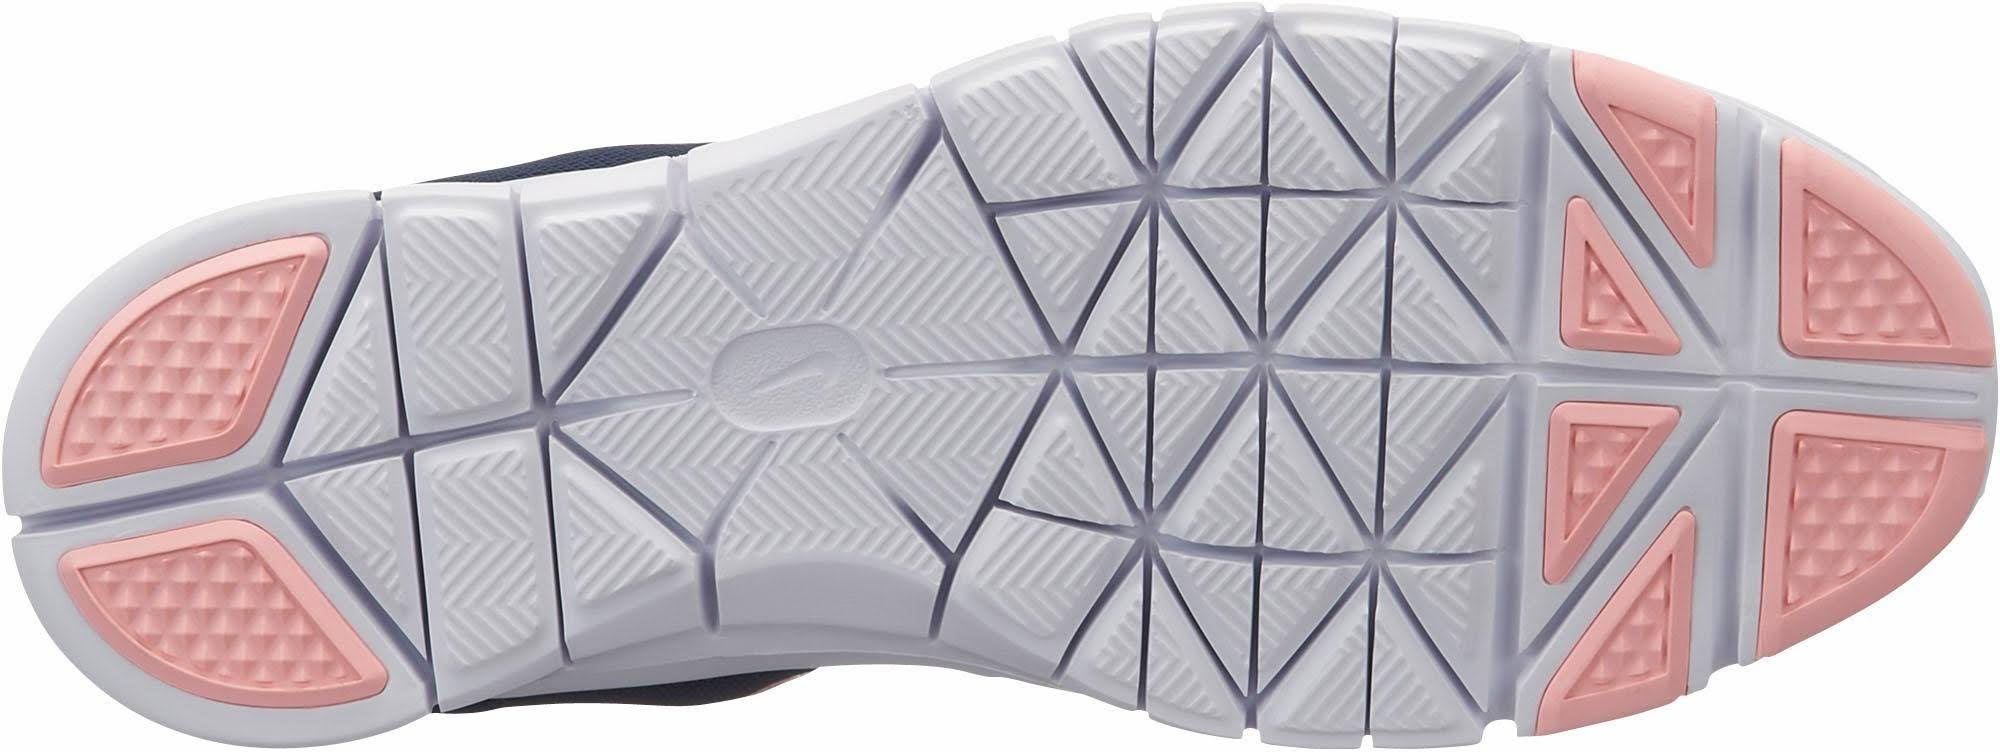 Essential Shoe Flex dames Donkerblauw 924344 Training Nike Fitness Schoenen tnW5wWxOR